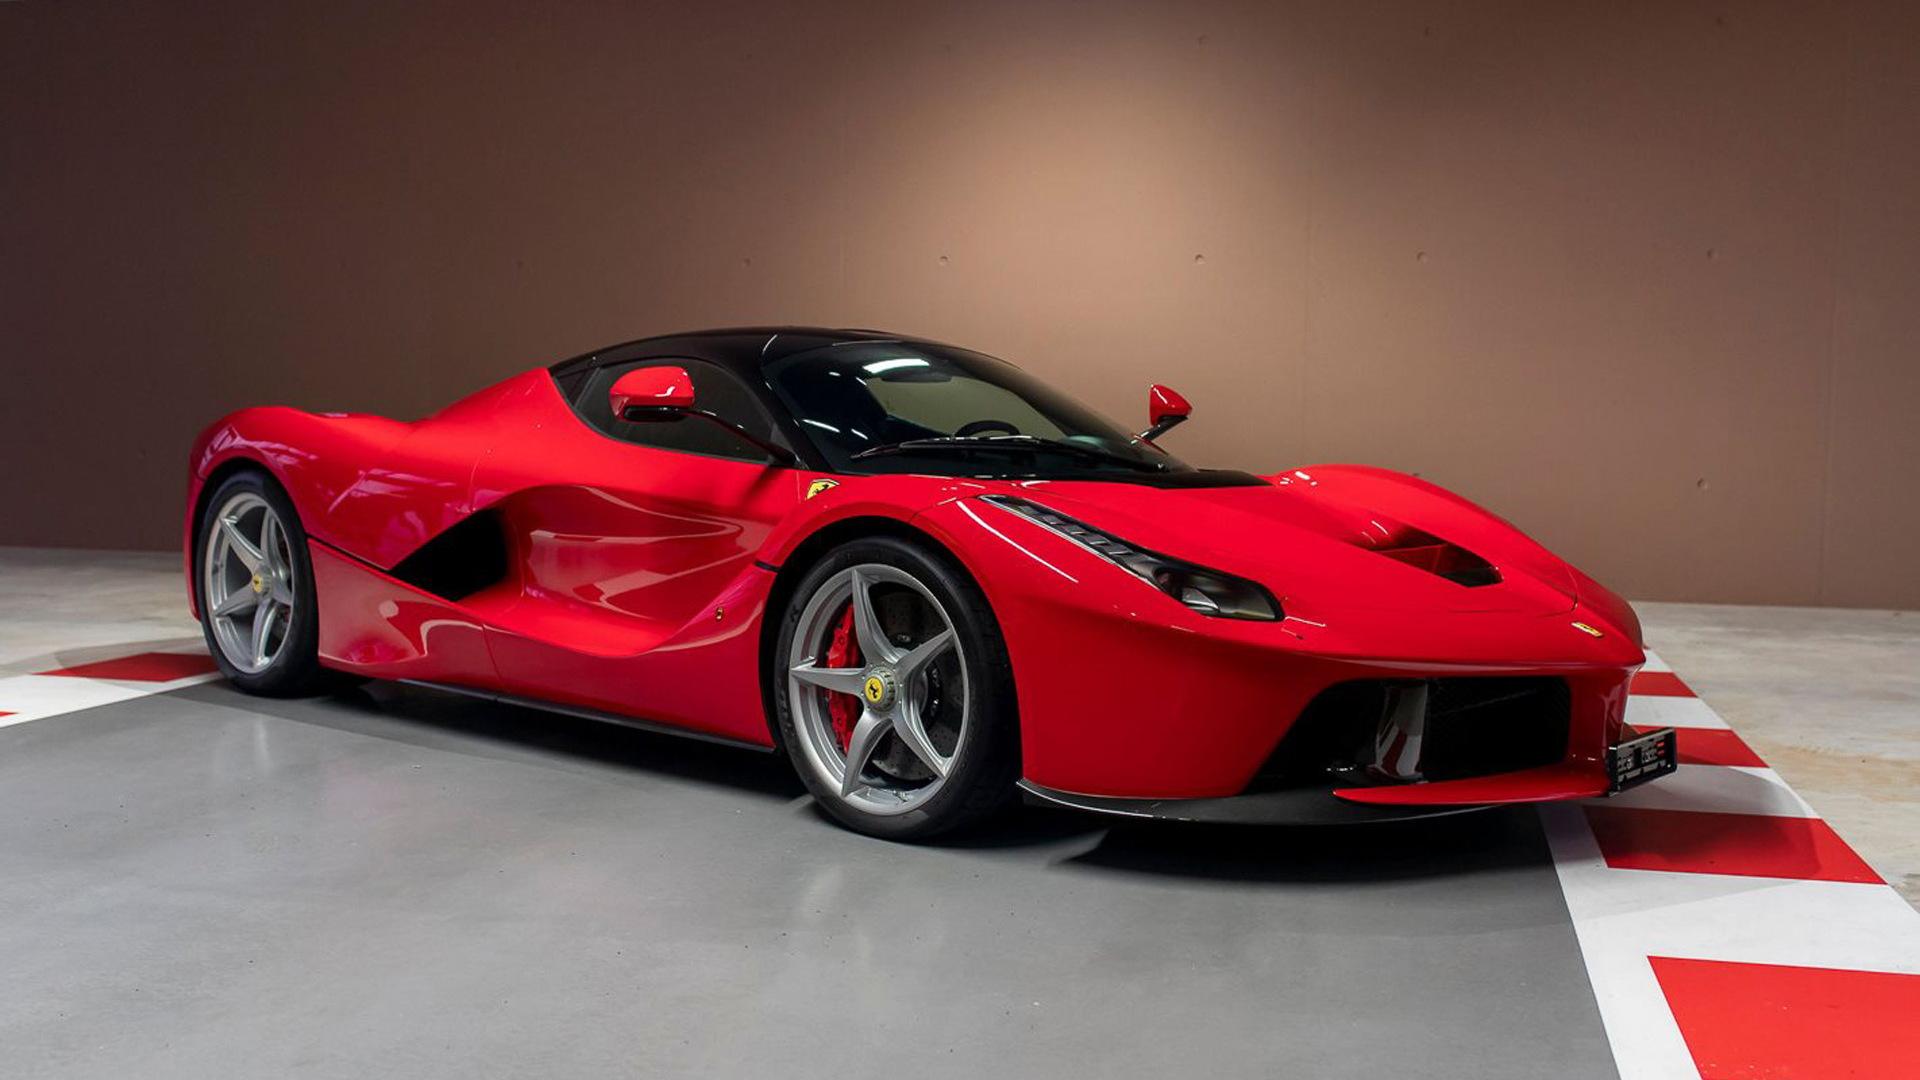 Ferrari LaFerrari once owned by Sebastian Vettel - Photo credit: Which Car/Tom Hartley Jnr